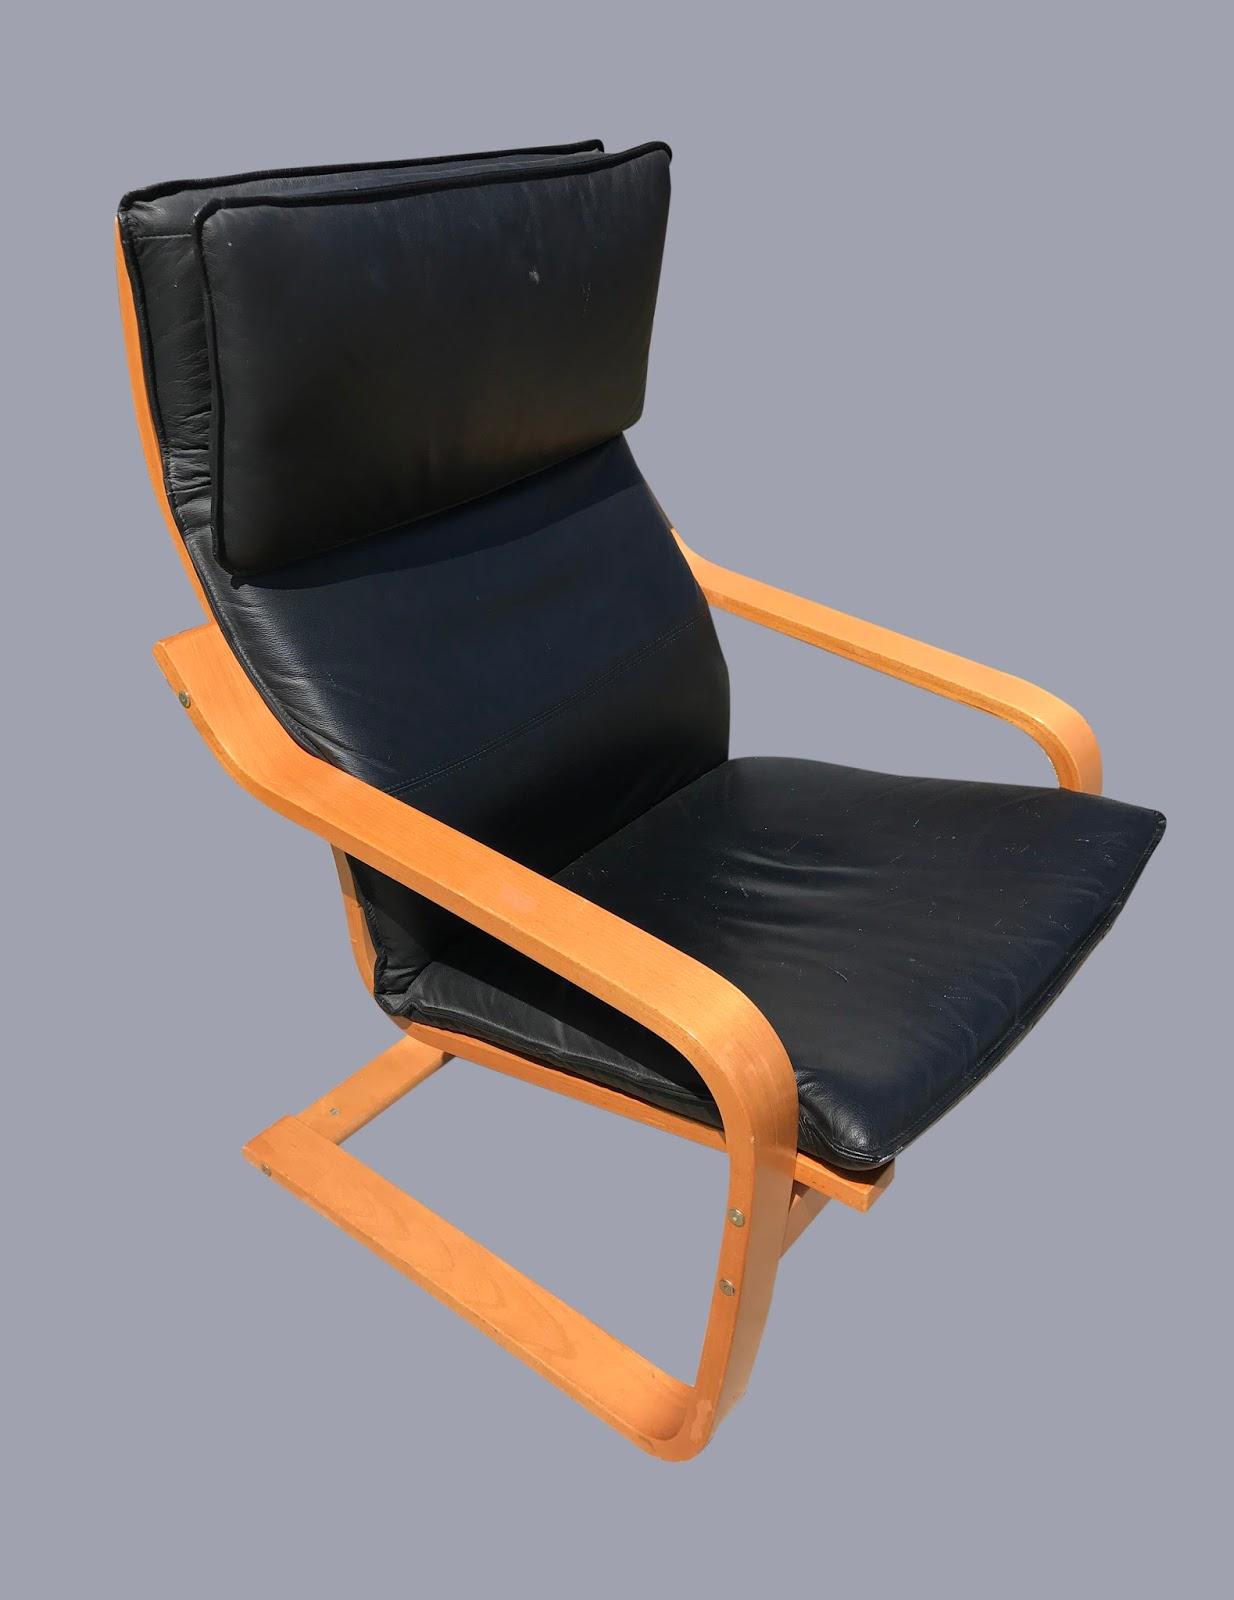 Uhuru furniture collectibles black leather ikea poang chair 75 sold - Ikea poang chair leather ...